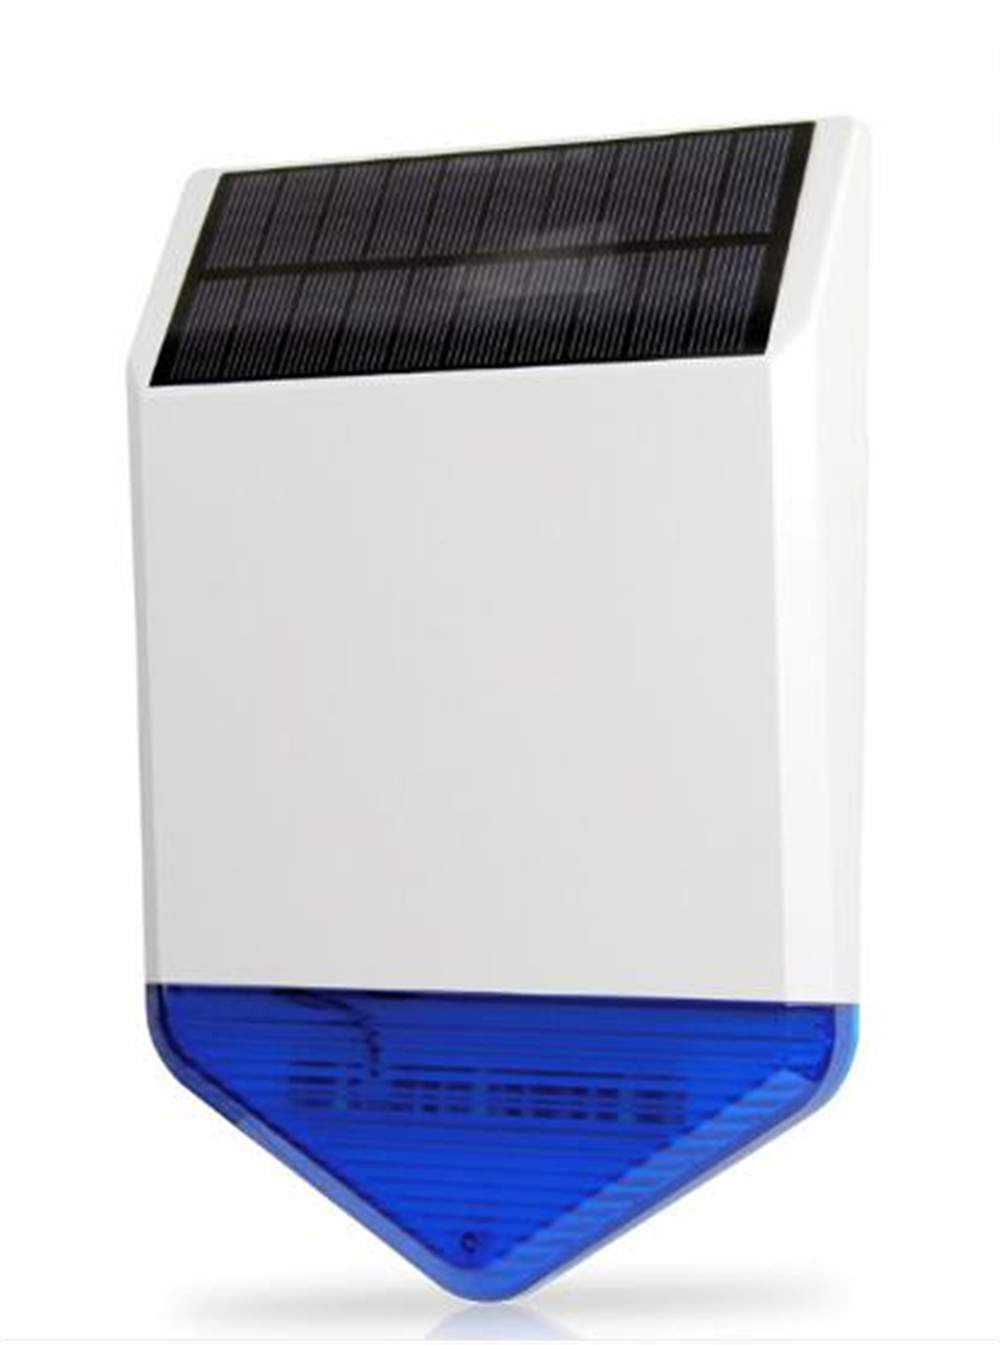 Outdoor Water-proof Solar Strobe Siren For Burglar Alarm System 433Mhz цена и фото